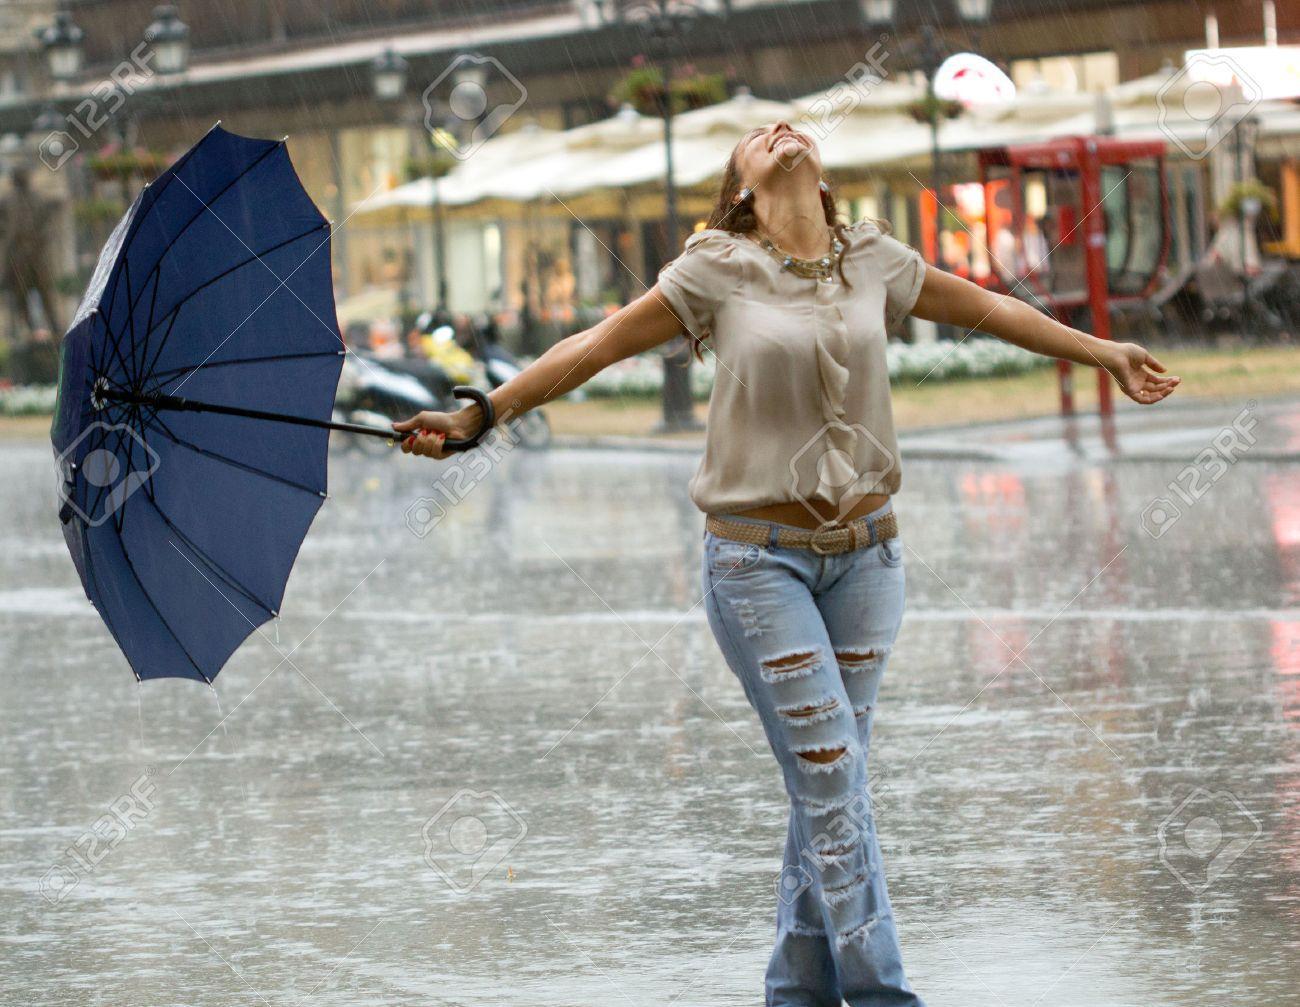 smiling woman with umbrella enjoying in the rain - 22742785